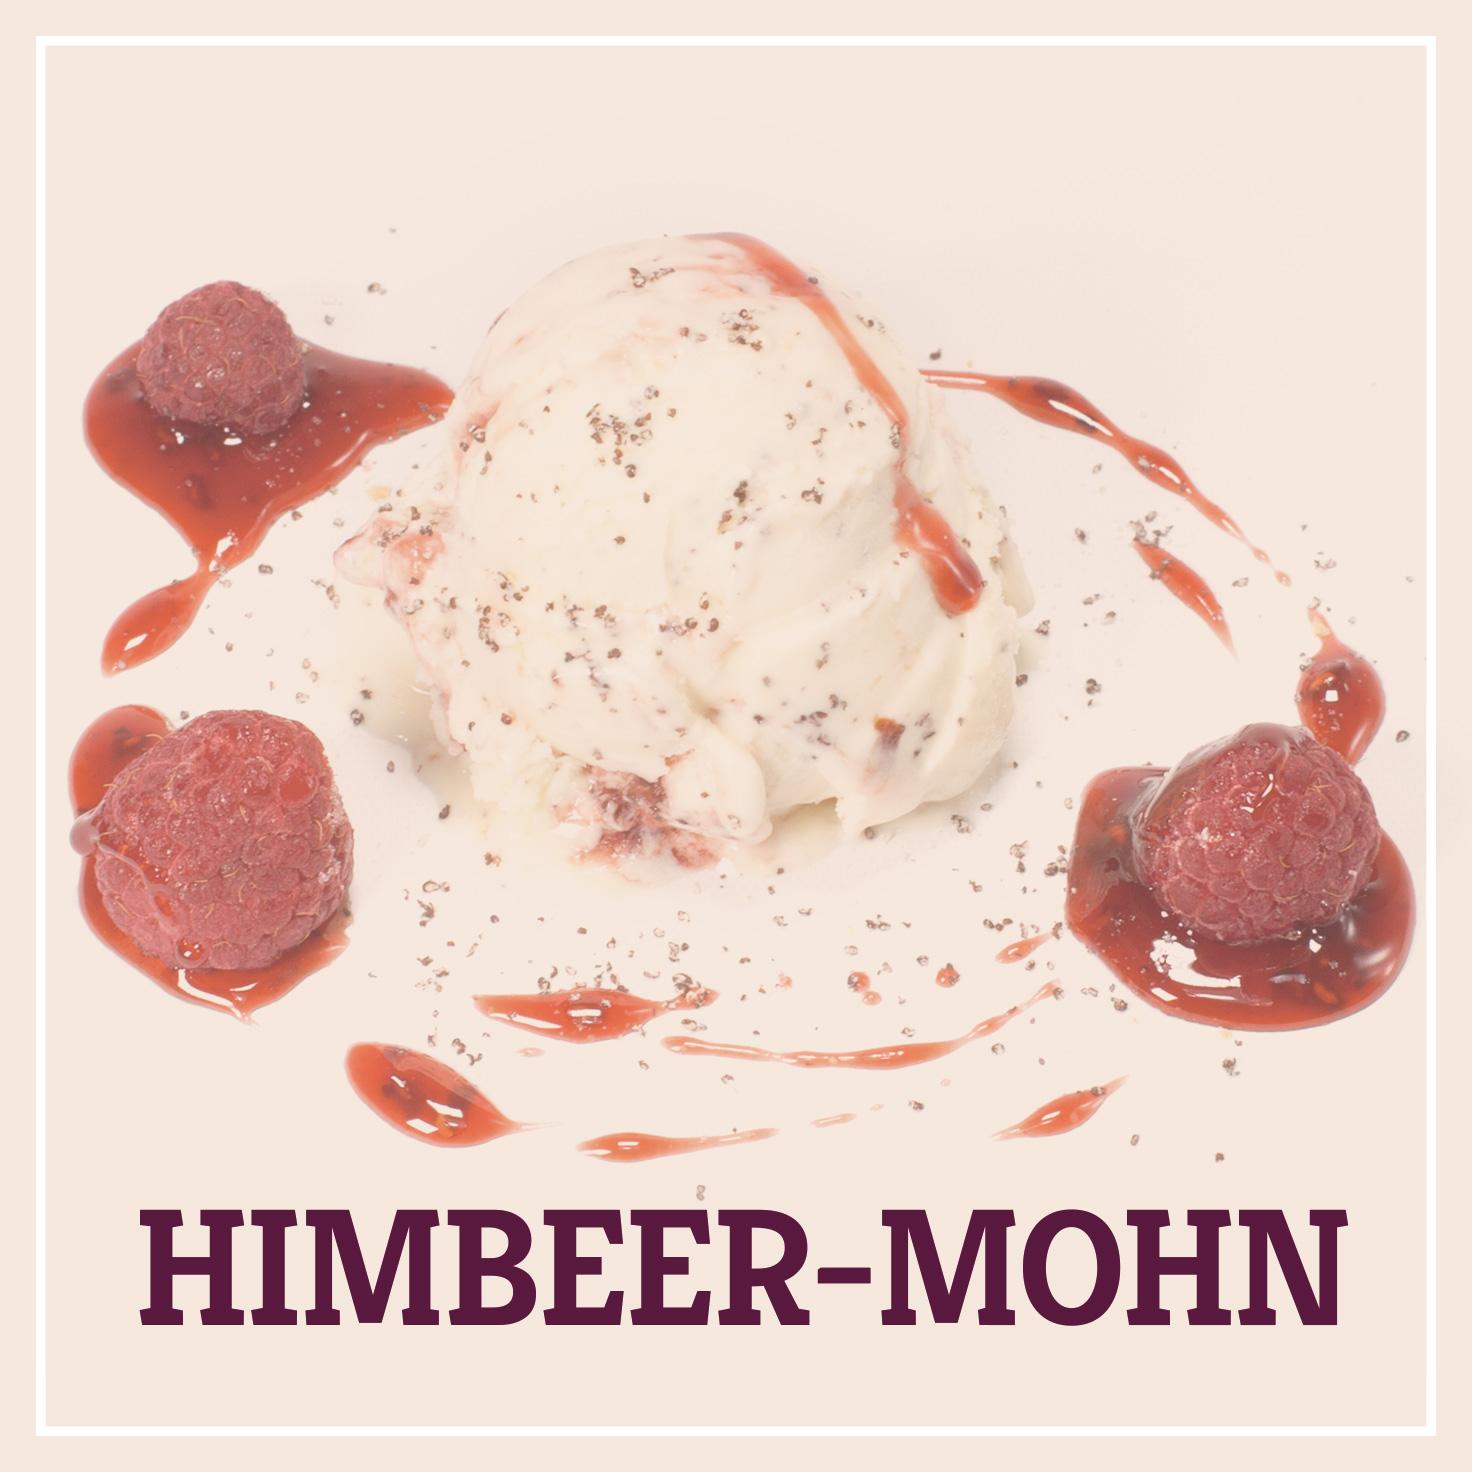 Heiss & Süß - Himbeer-Mohn